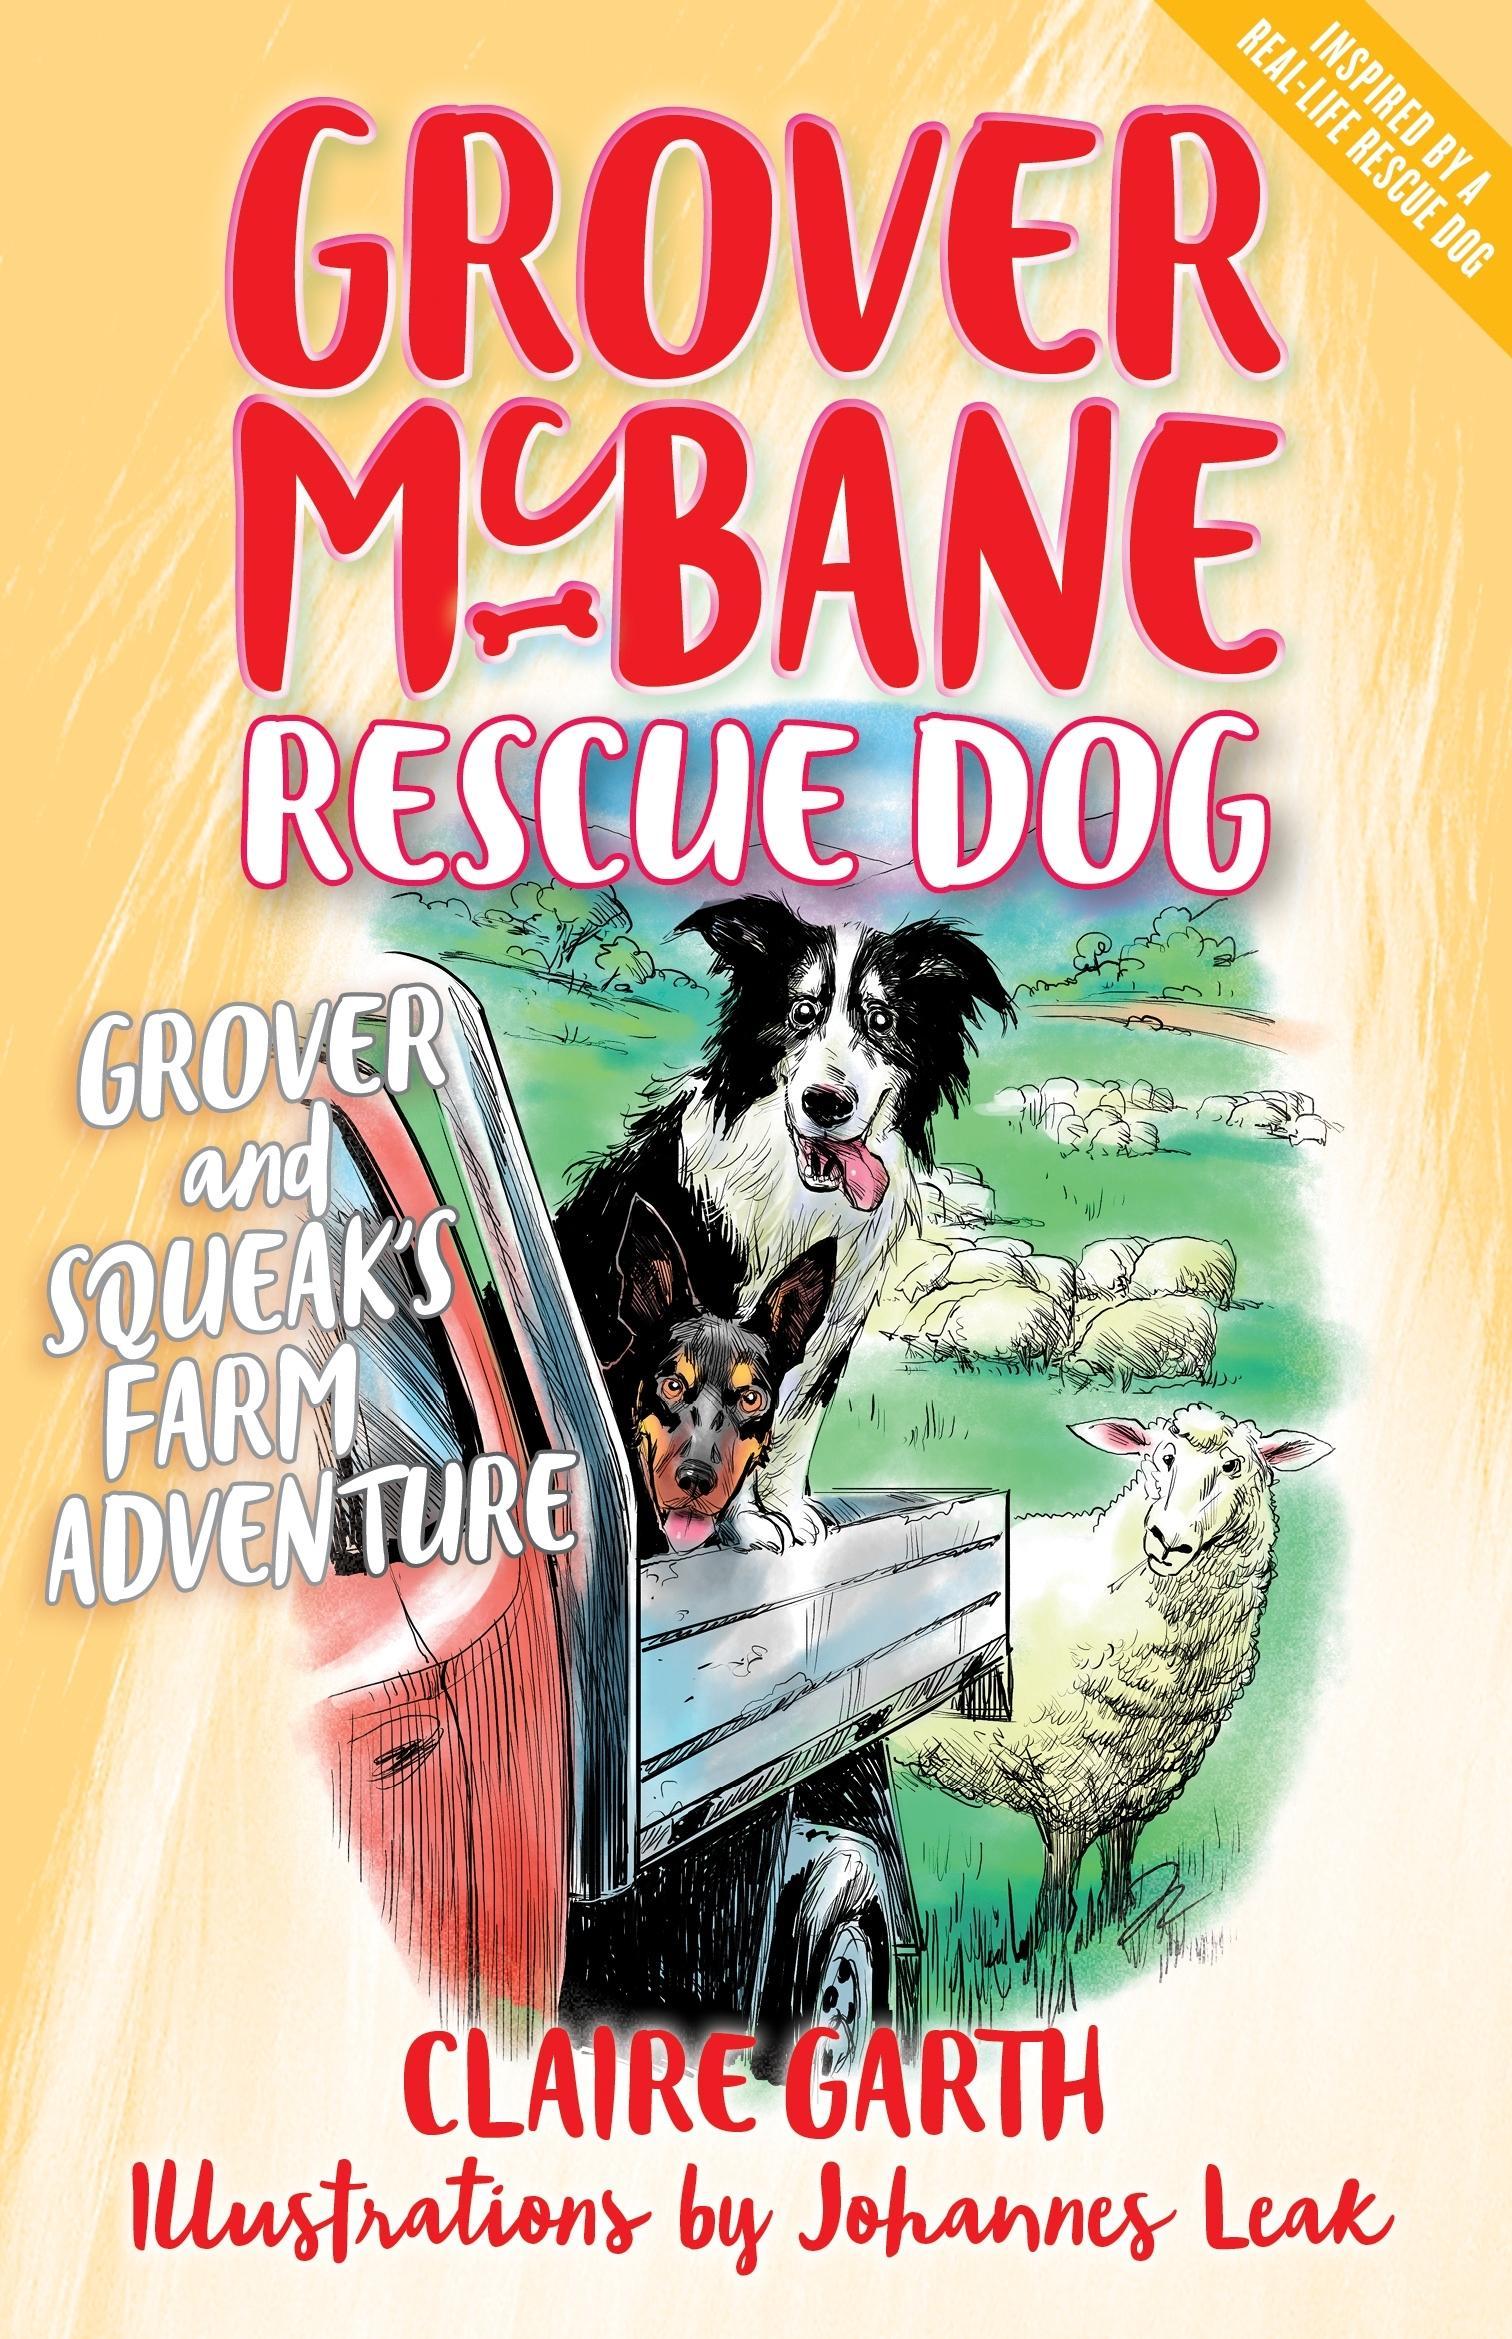 Grover and Squeak's Farm Adventure (Grover McBane, Rescue Dog Book 4)